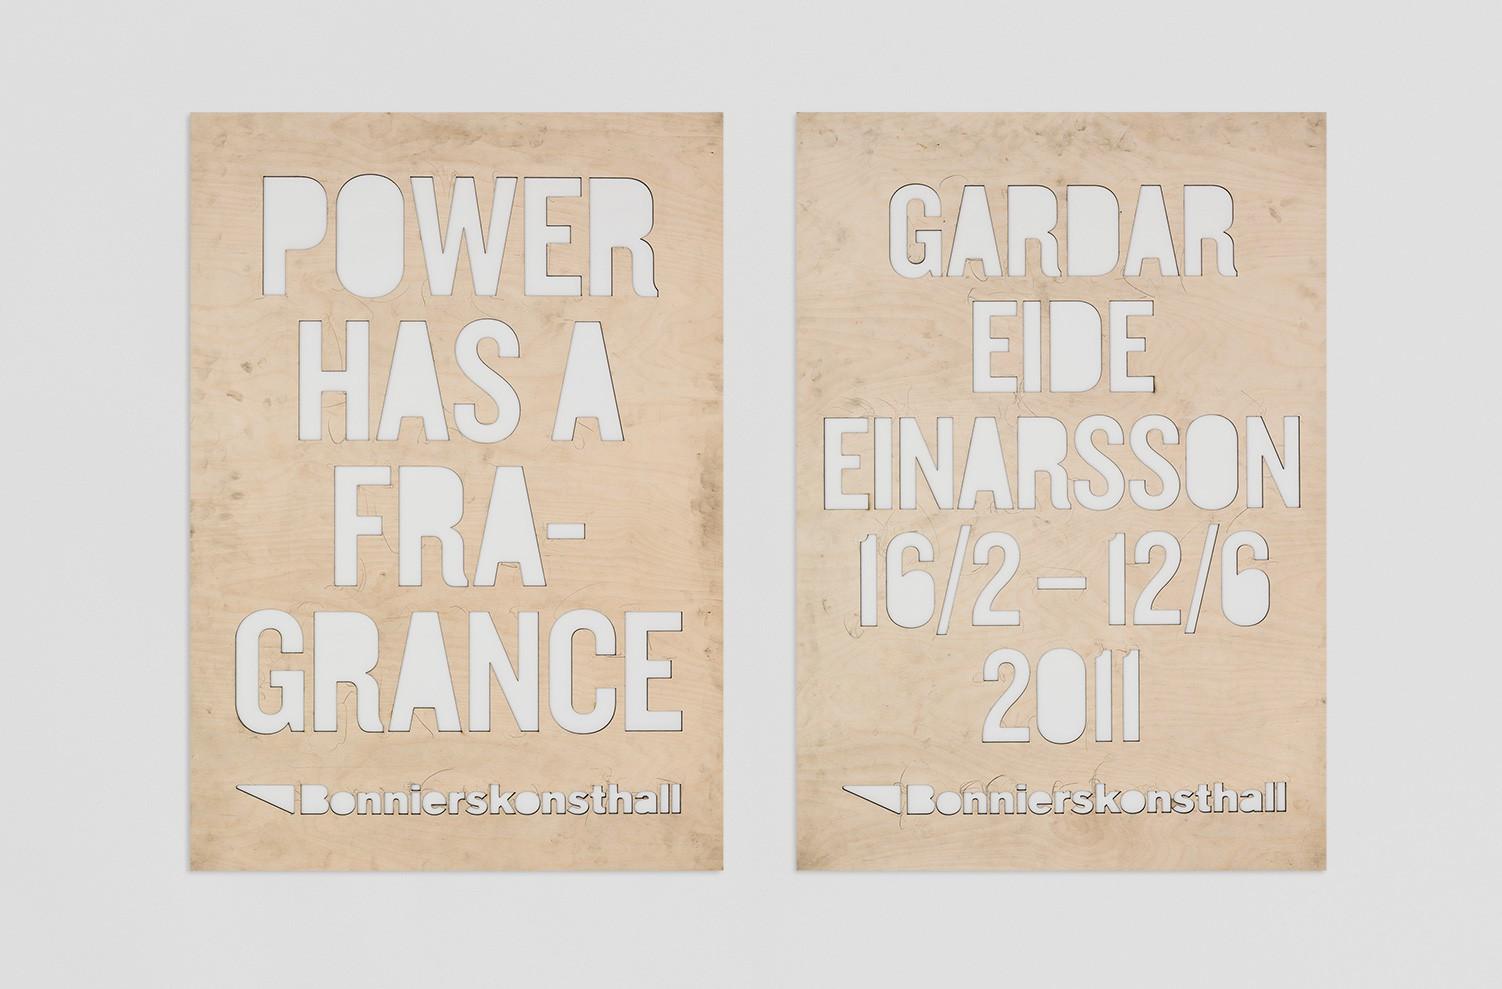 ritator_bonniers_konsthall_gardar_eide_einarsson_campaign_22